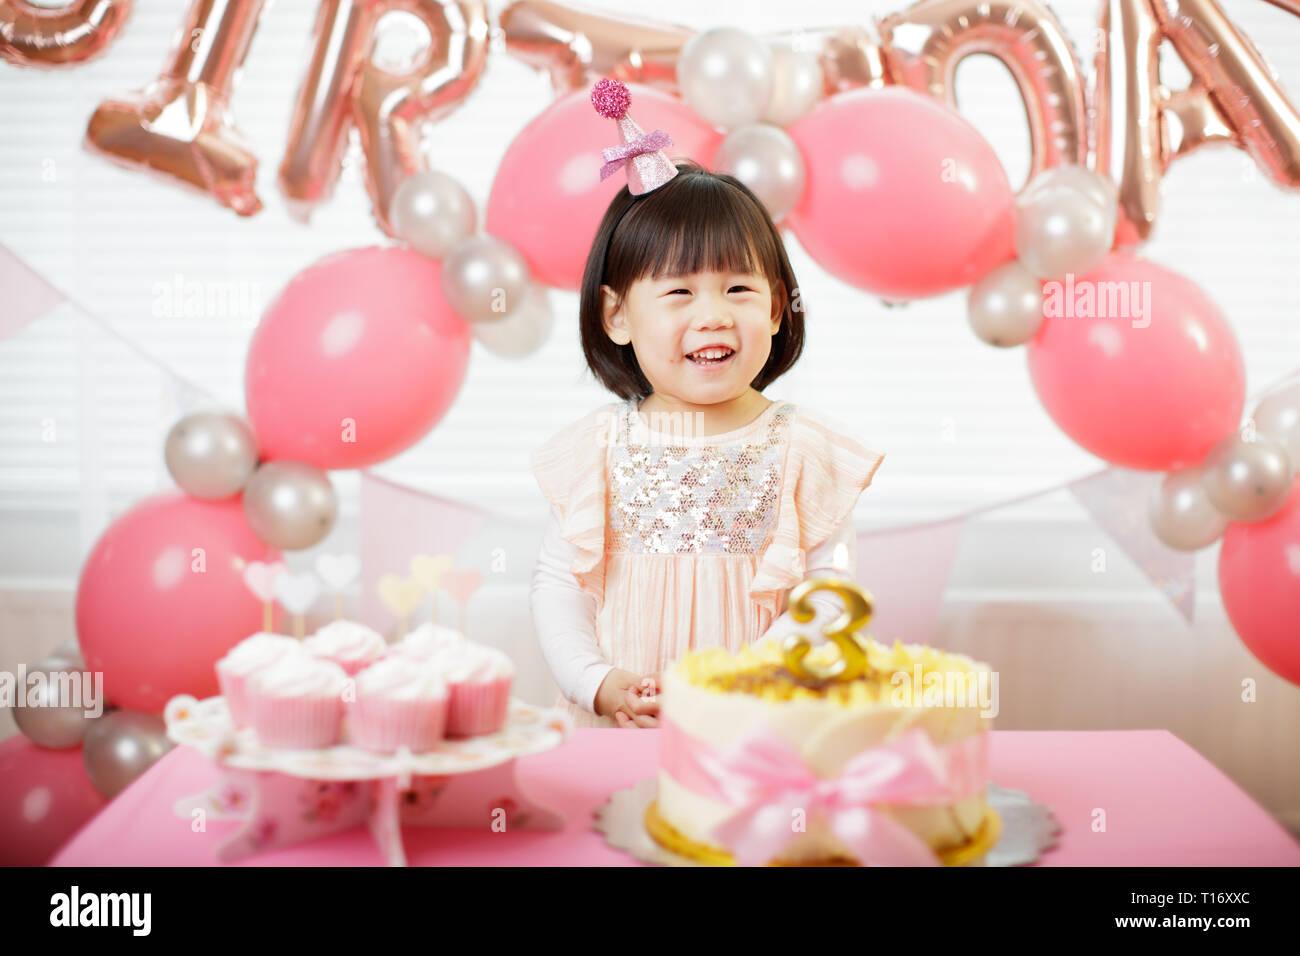 Tremendous Toddler Girl Celebrating Her Third Birthday At Home Stock Photo Birthday Cards Printable Benkemecafe Filternl